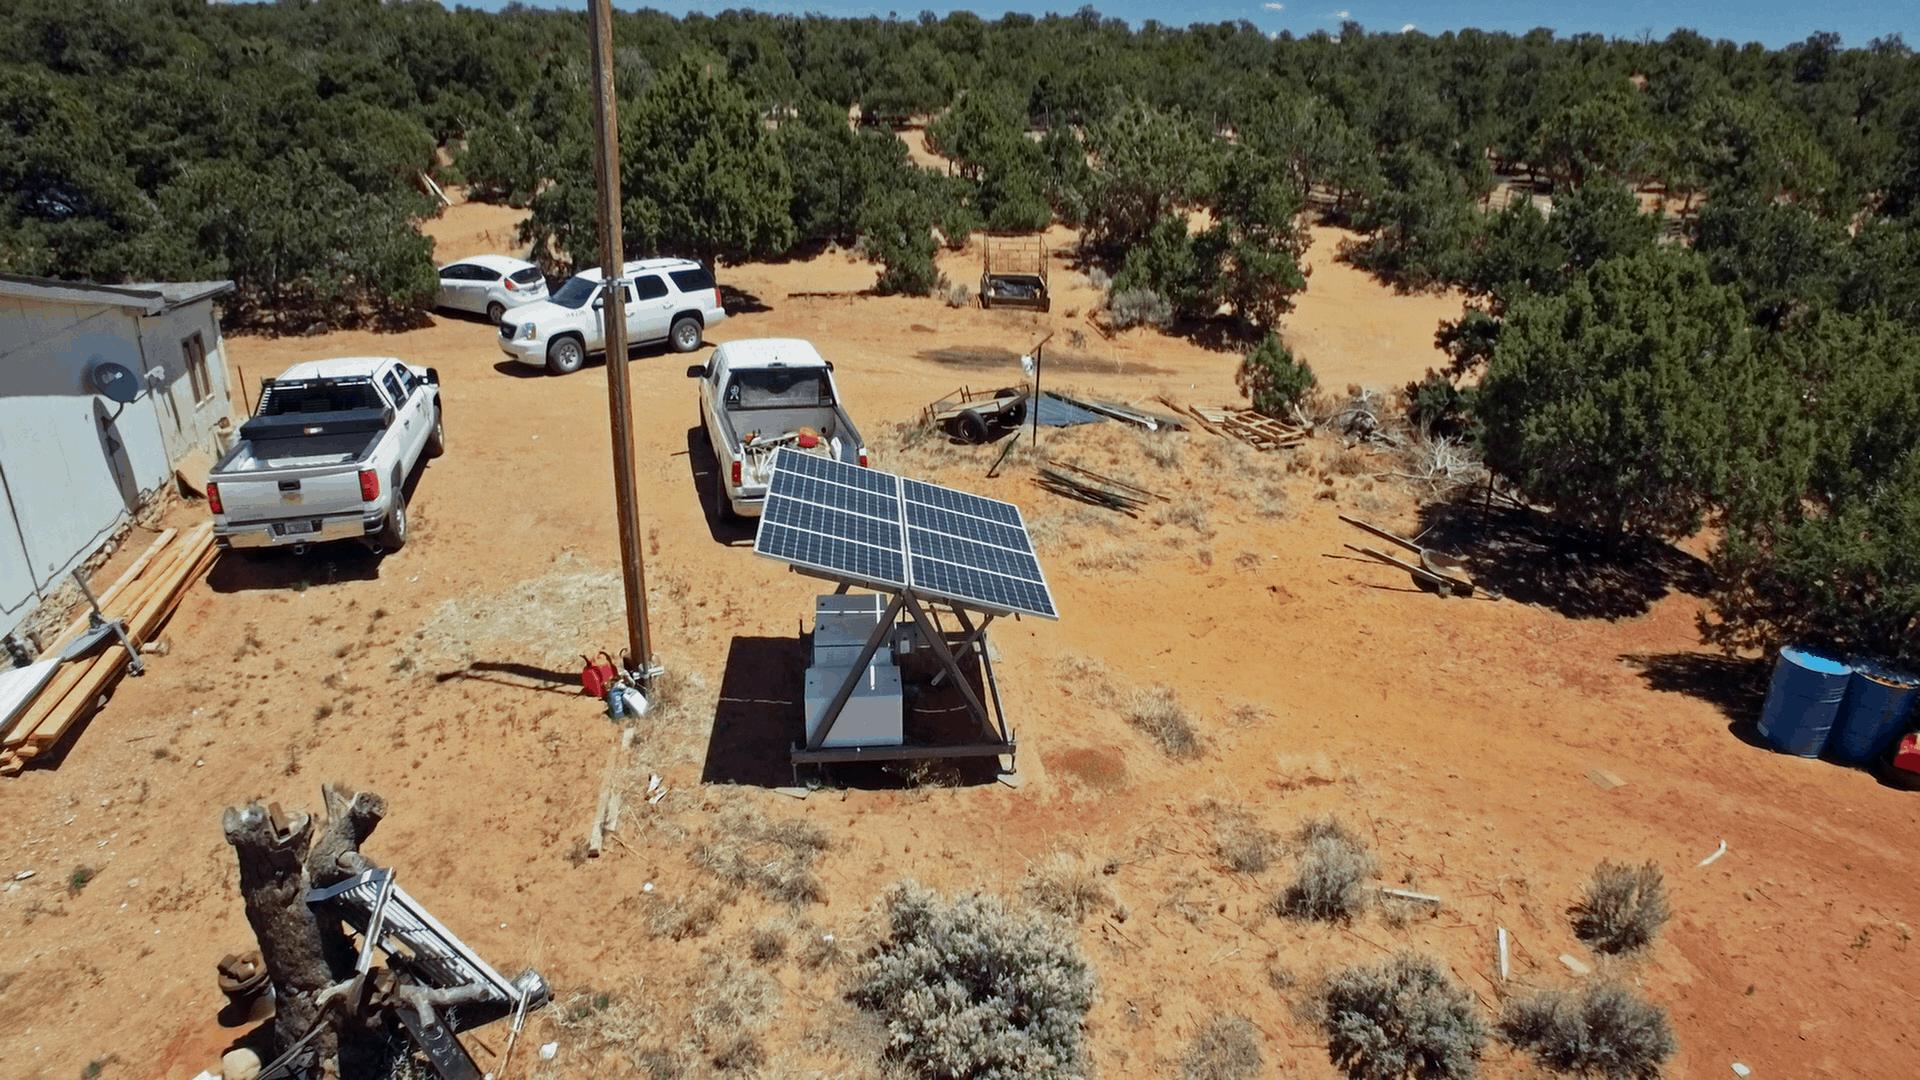 Jonathan Scott's Power Trip (2020) [Must-Watch Energy Suppression Documentary] 3